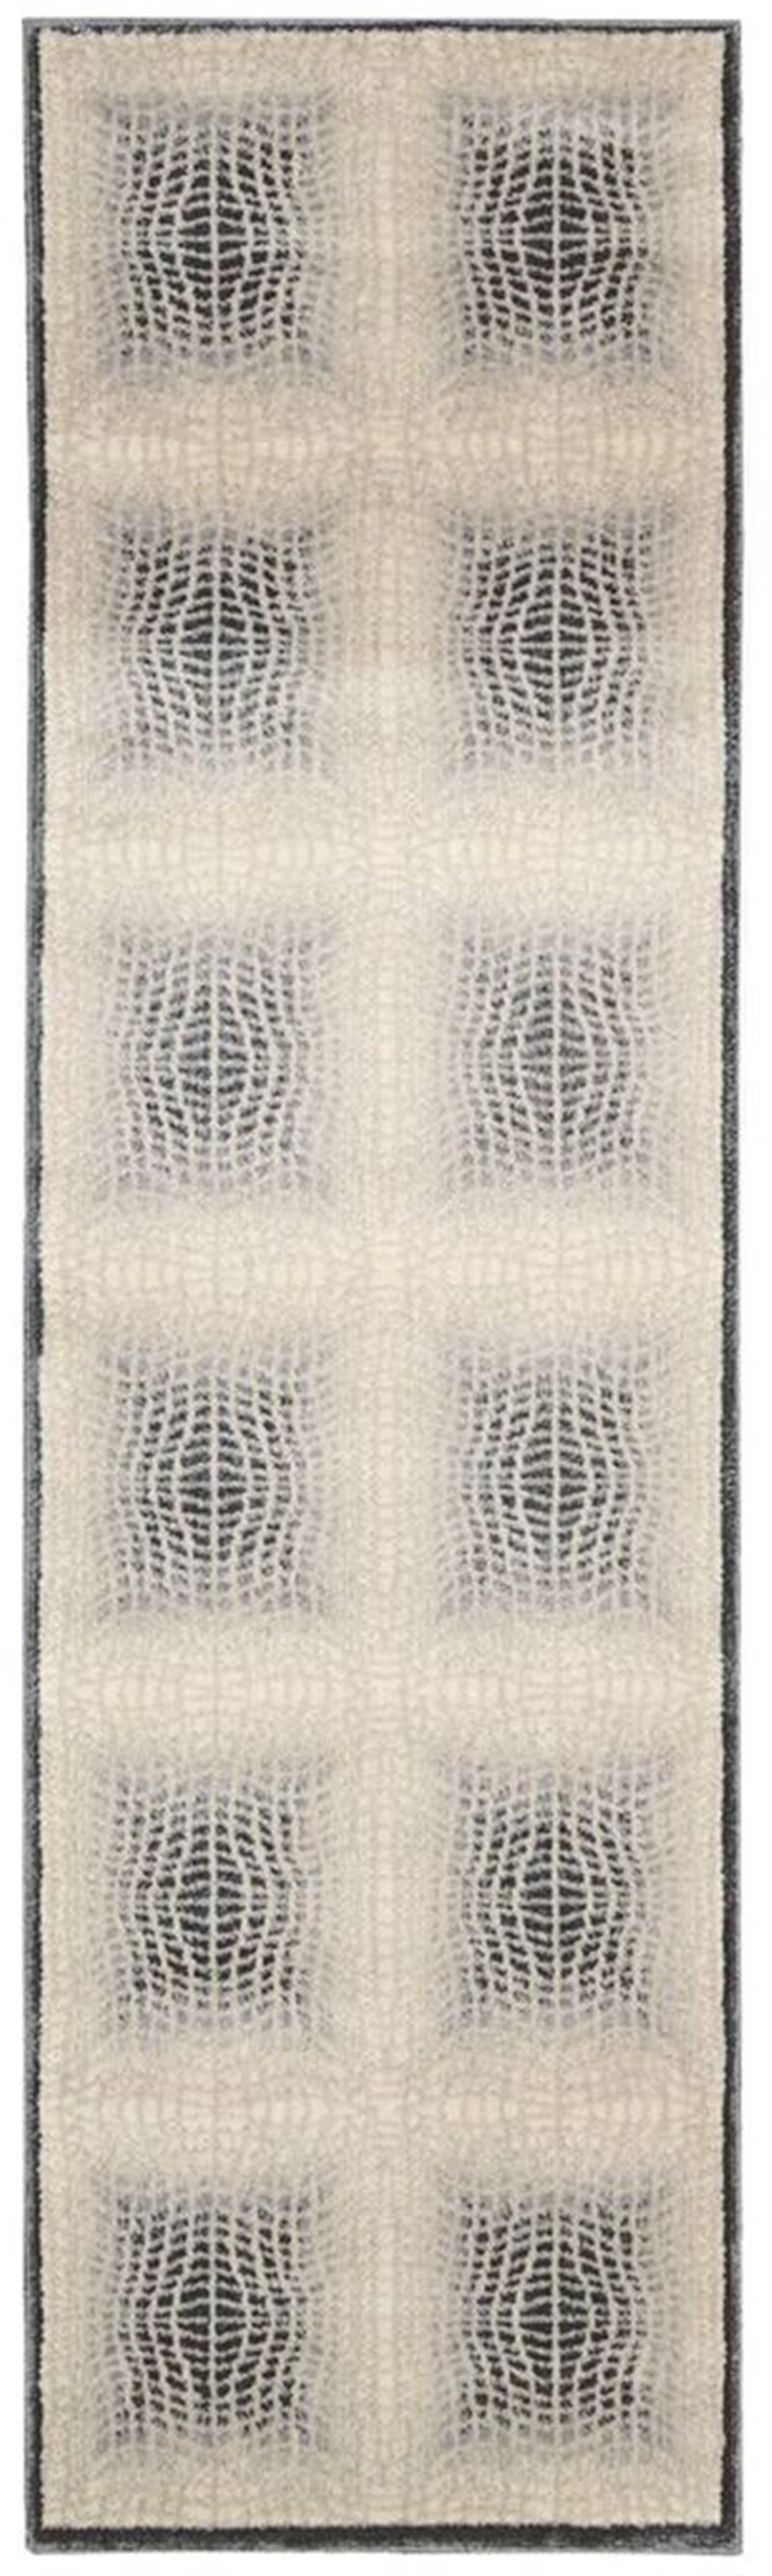 nourison-utopia-shell-area-rug